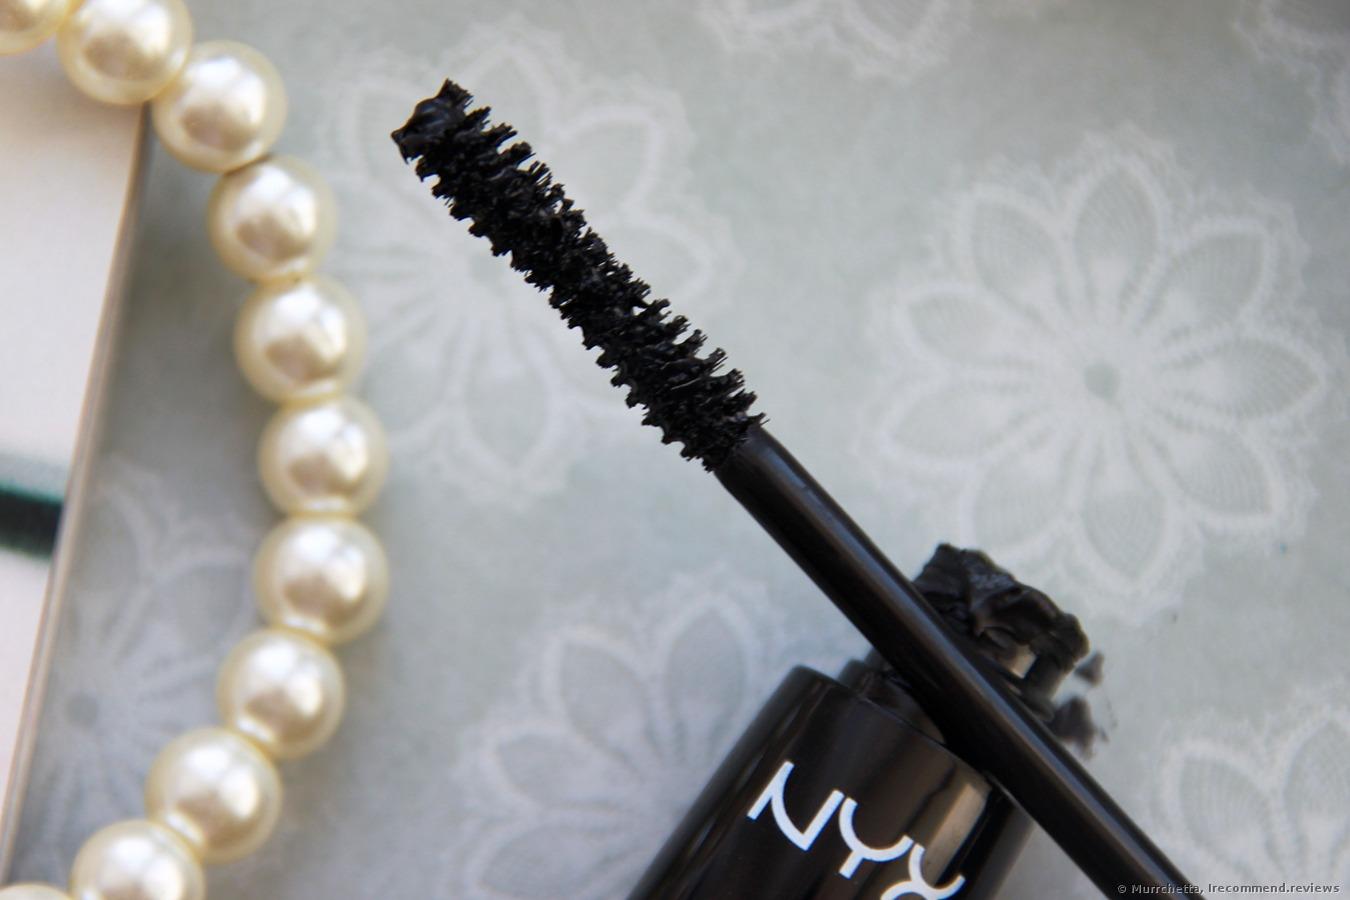 how to make regular mascara waterproof